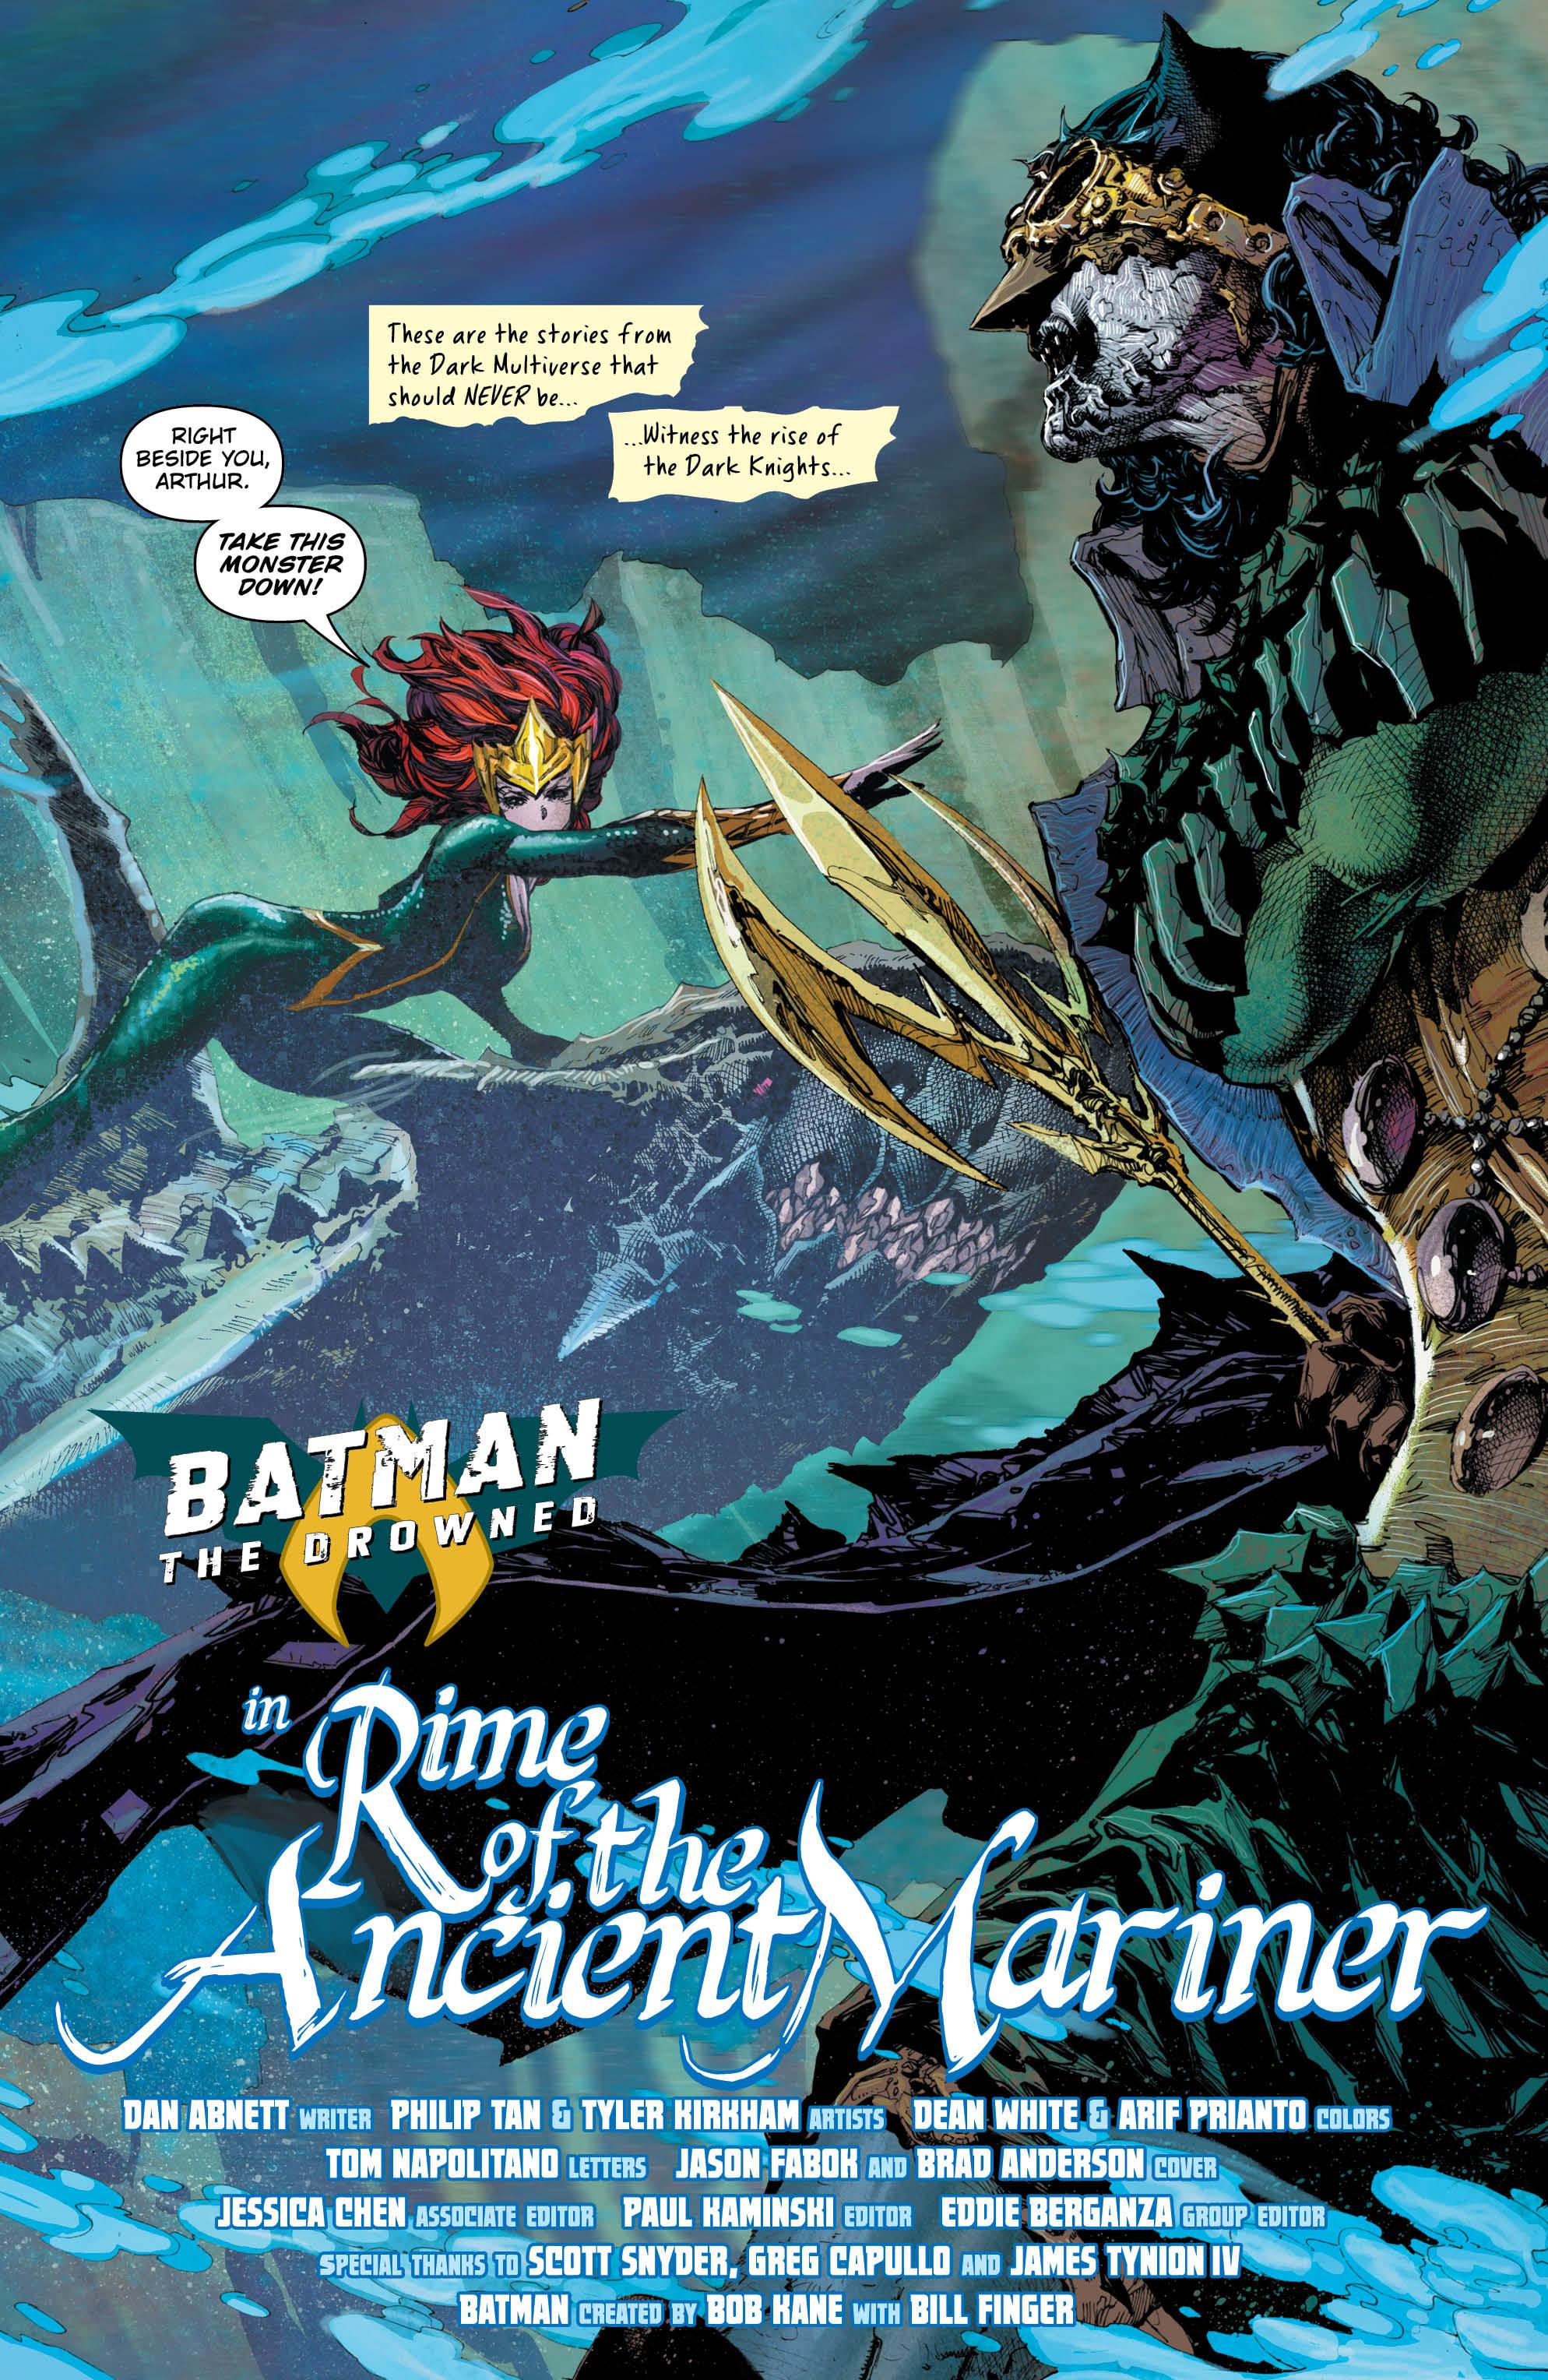 Batman: The Drowned #1